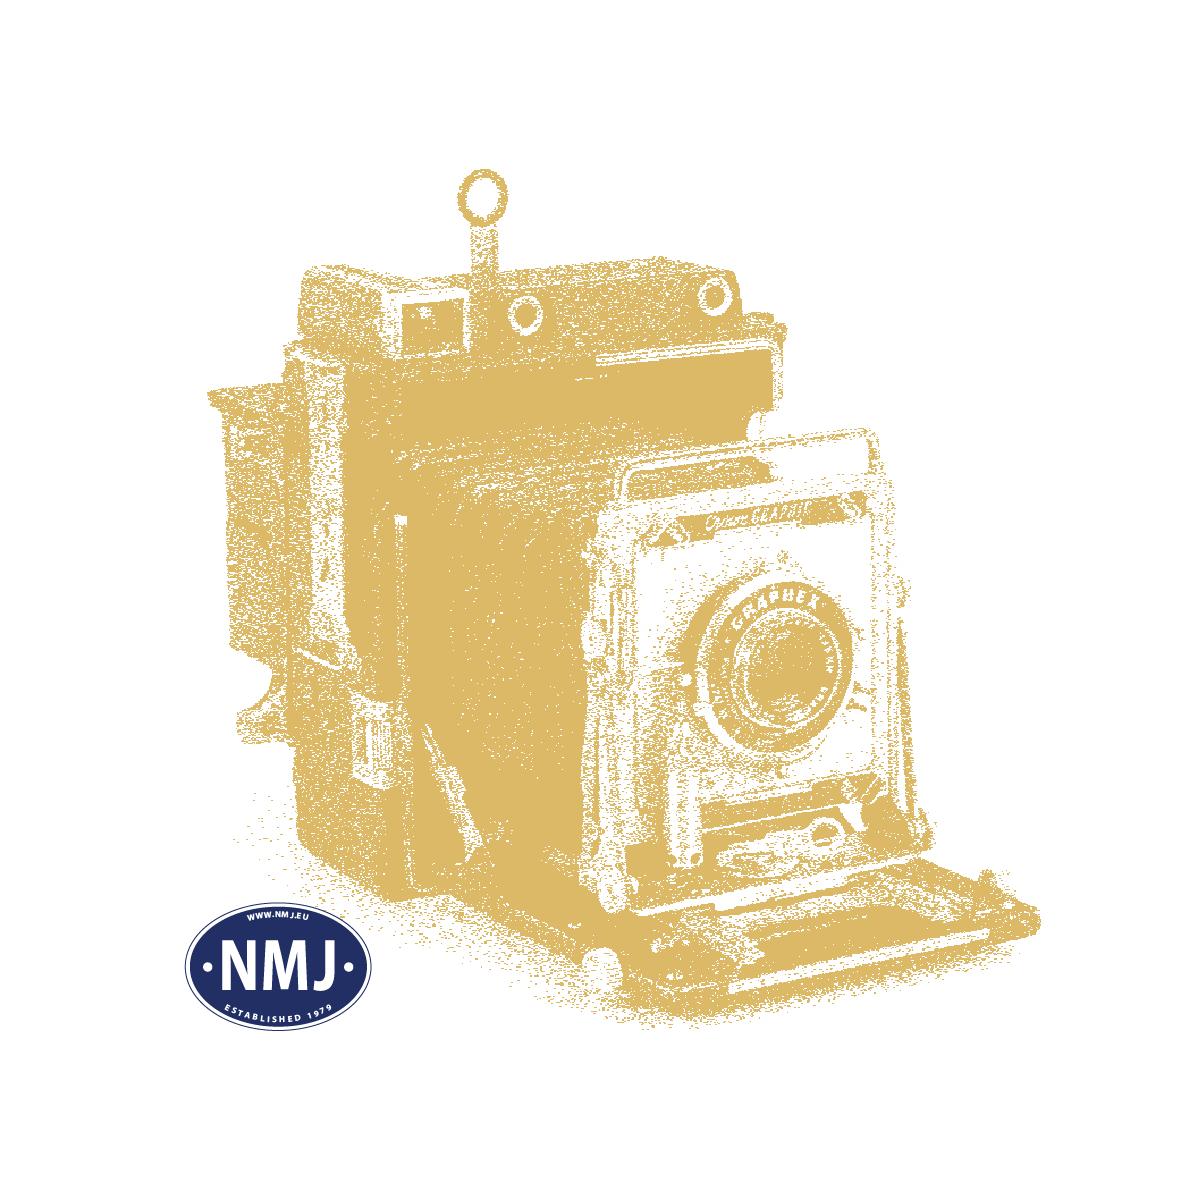 NMJT145001 - NMJ Topline NSB Di3.602 Grønn, 0-Skala